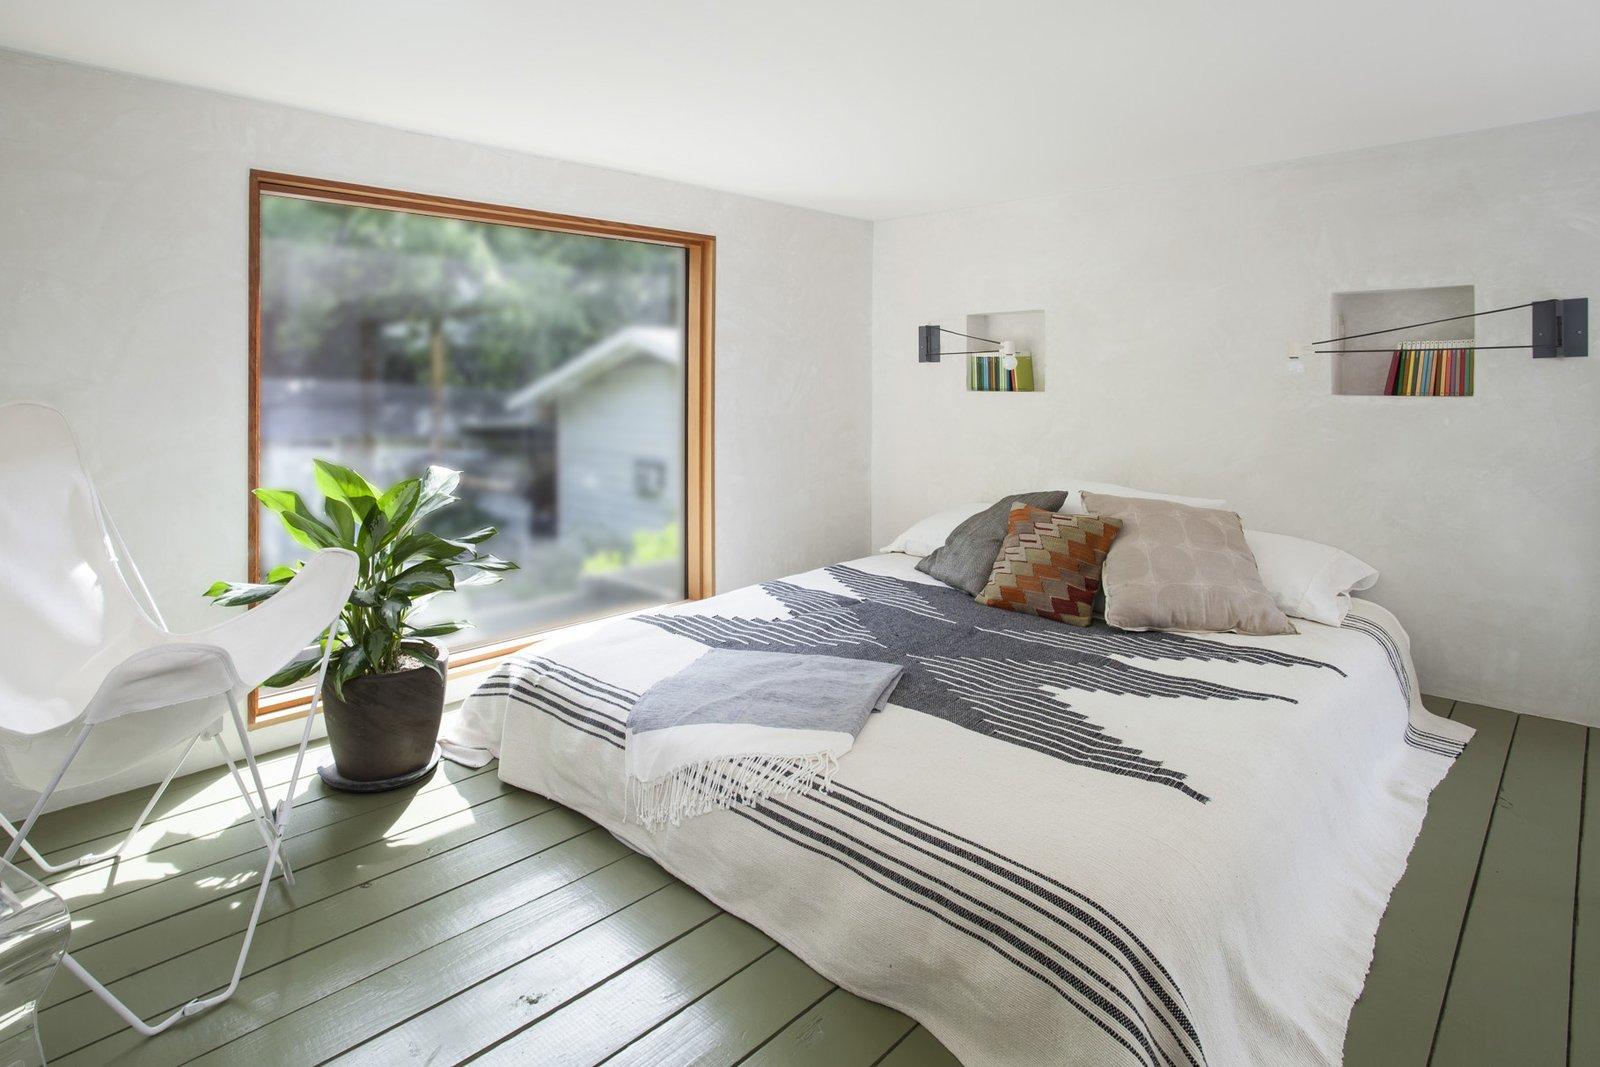 The small sleeping loft integrates plaster niches for storage.  Garner Pool & Casita by Elizabeth Baird